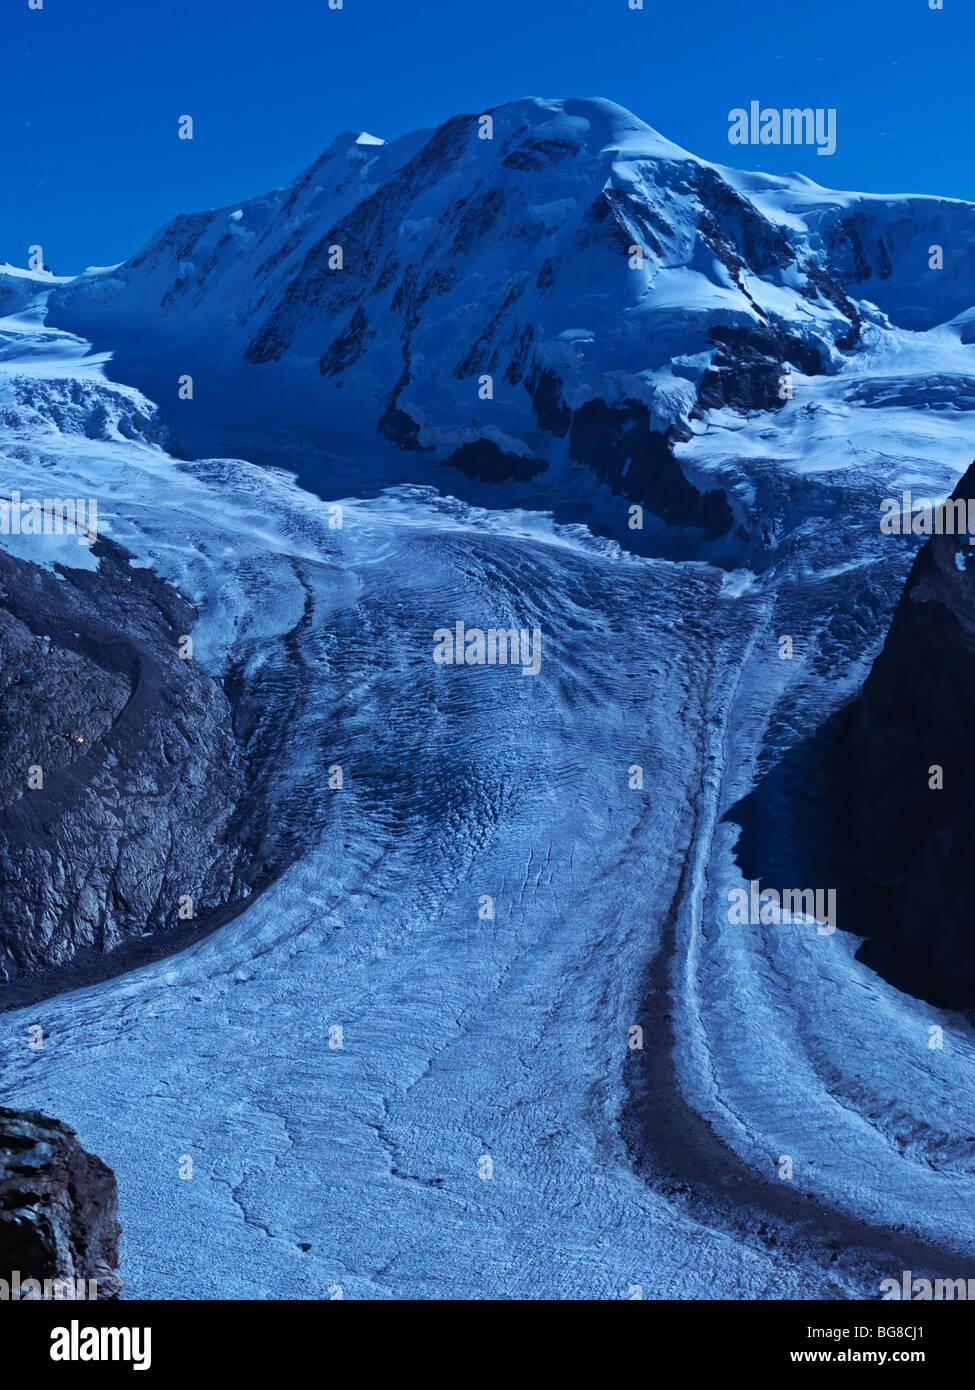 Switzerland, Valais, Zermatt, Gornergrat,Mount Breithorn and the Gorner Glacier illuminated by moon light - Stock Image